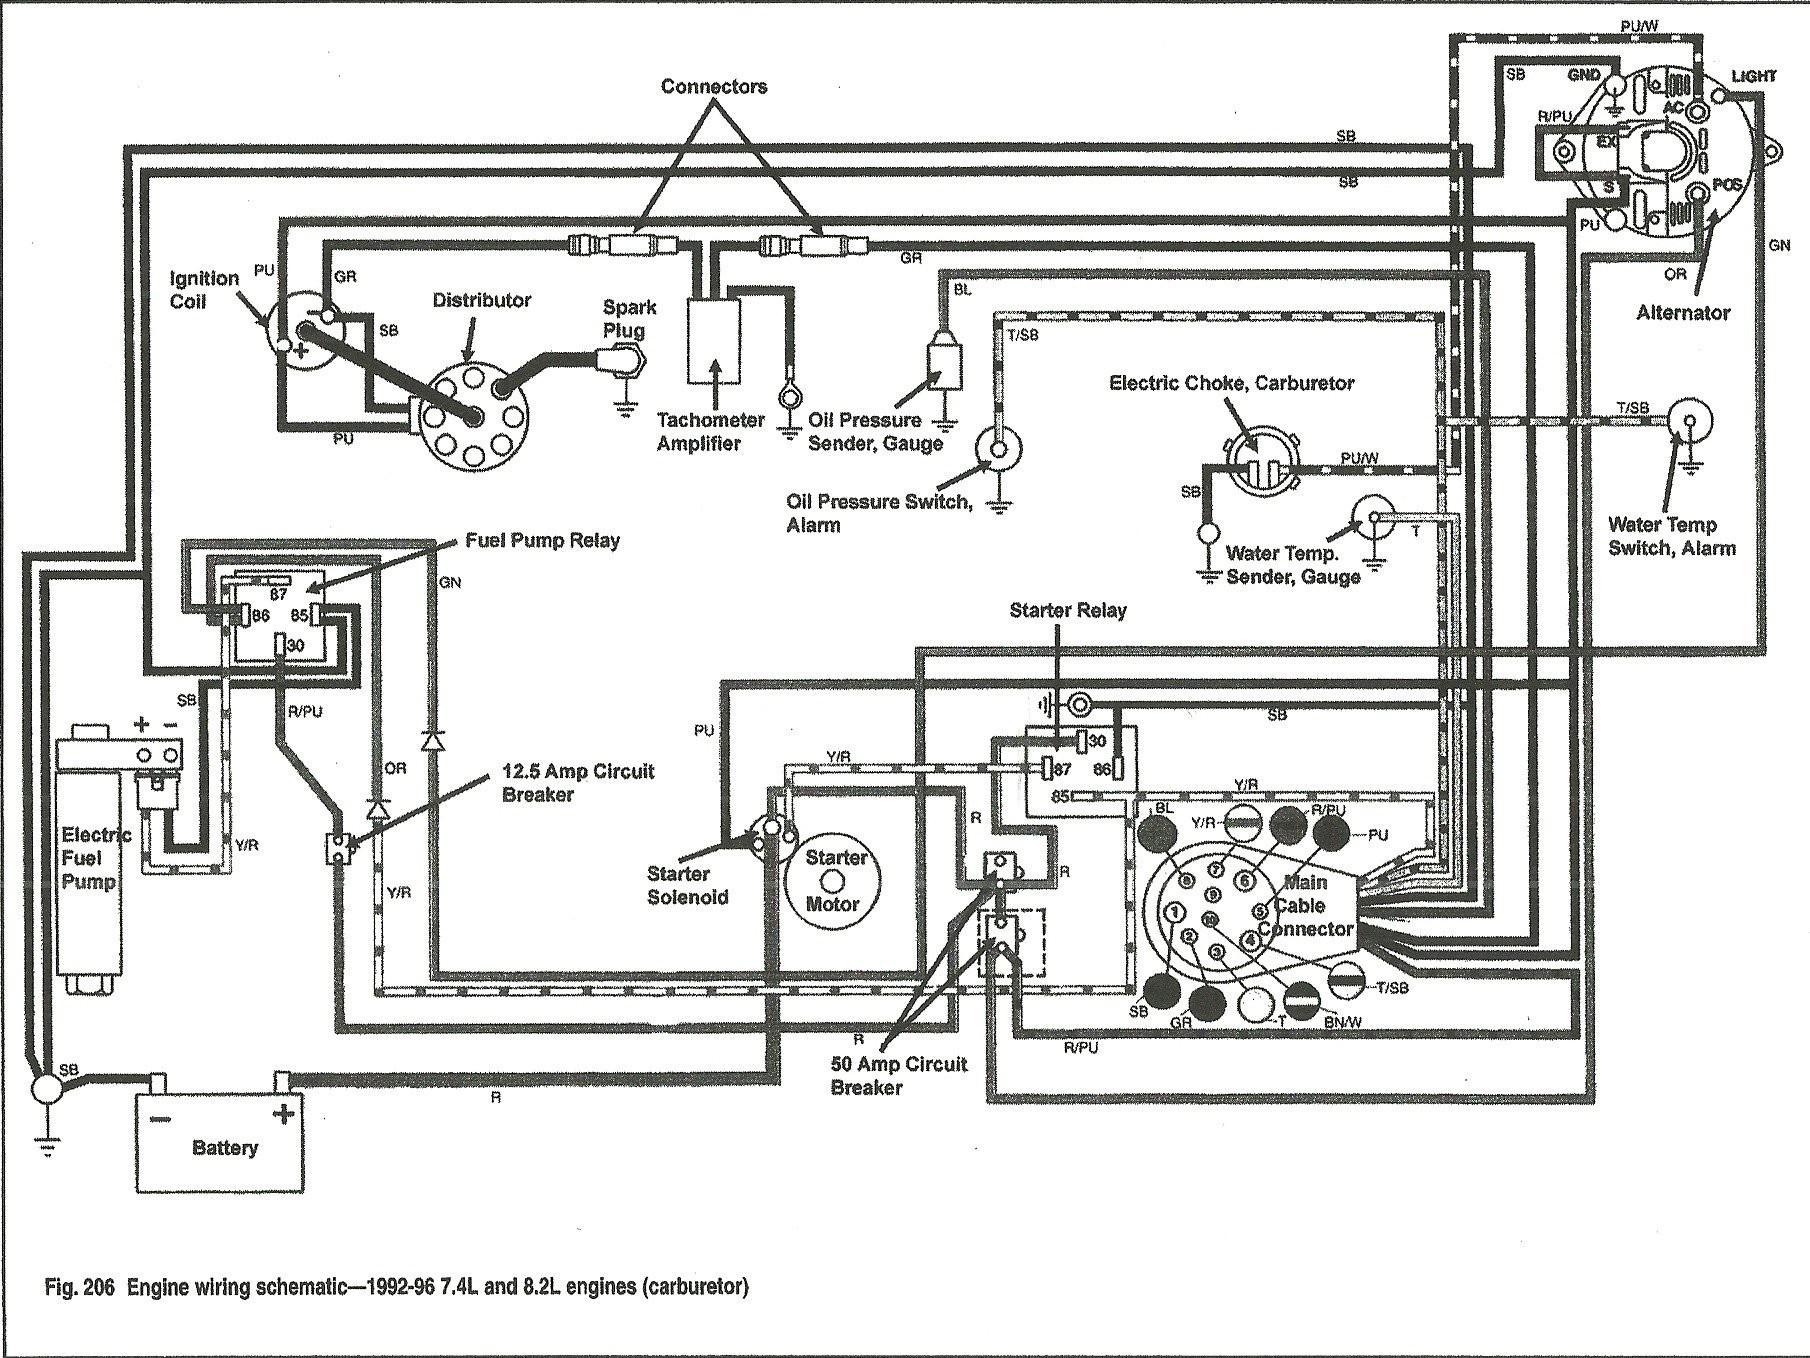 Enjoyable Alternator Wiring Diagram Also Volvo Marine Alternator Wiring Wiring Cloud Orsalboapumohammedshrineorg